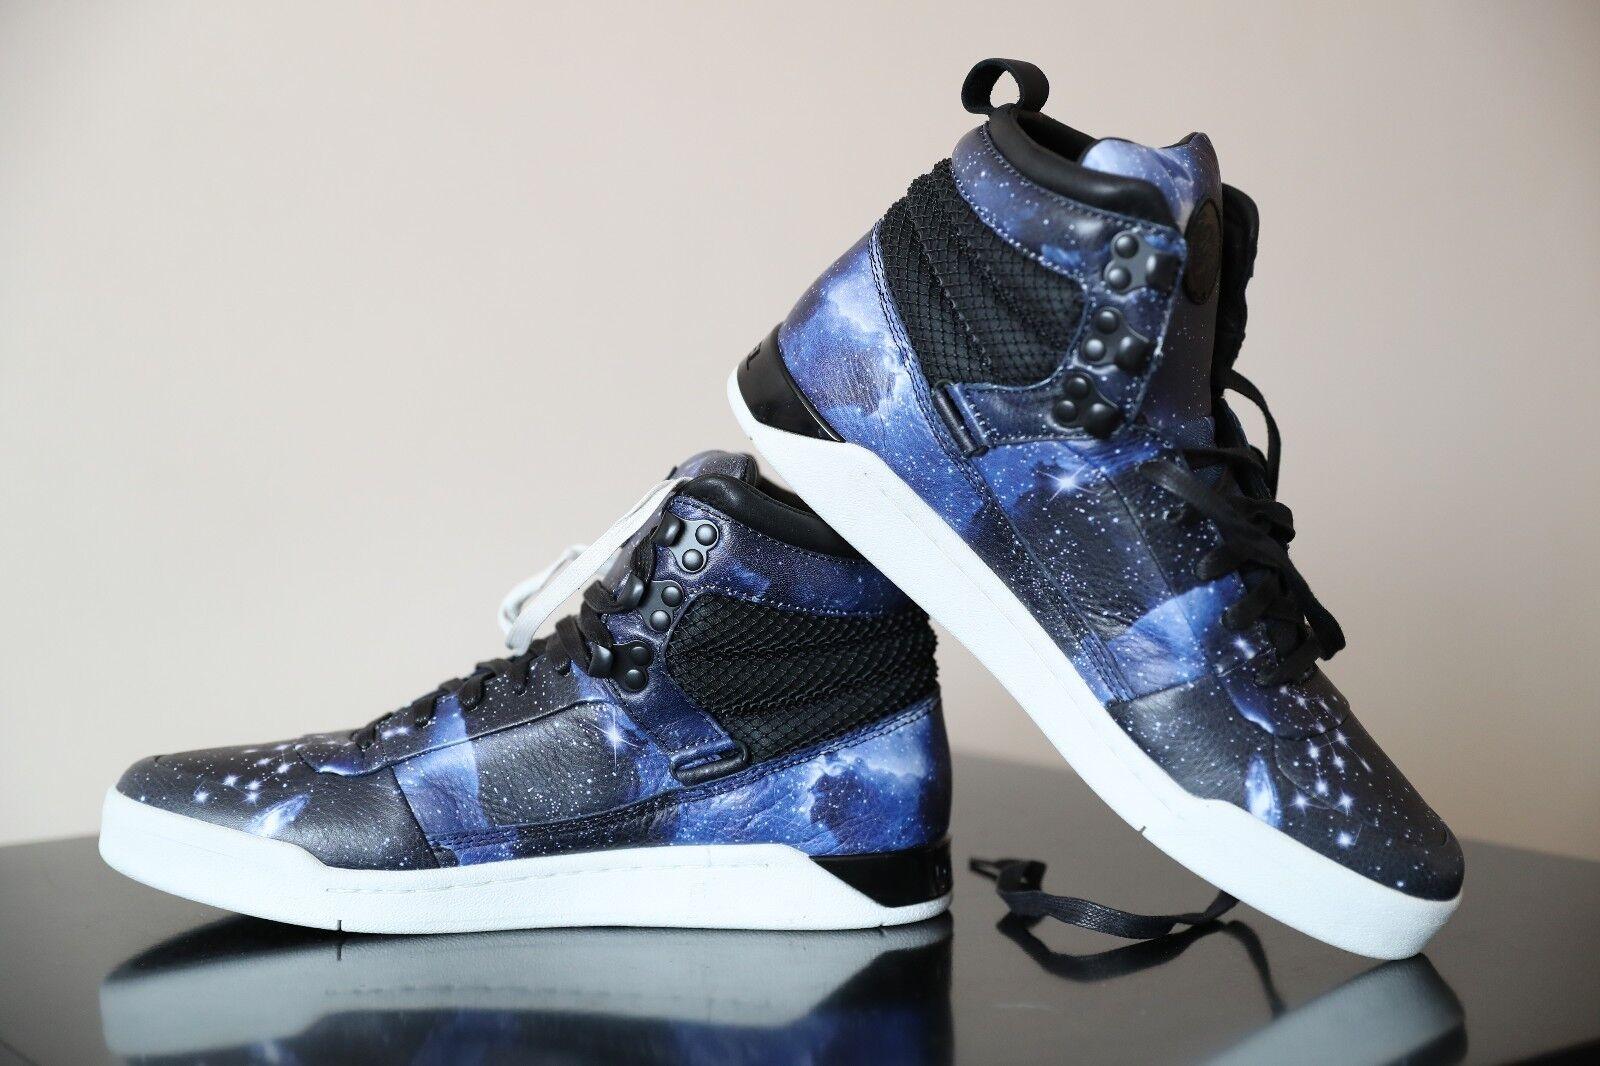 Diesel Onice hombres zapatos zapatos zapatos talla UK 8.5 EUR 42.5 0ad772